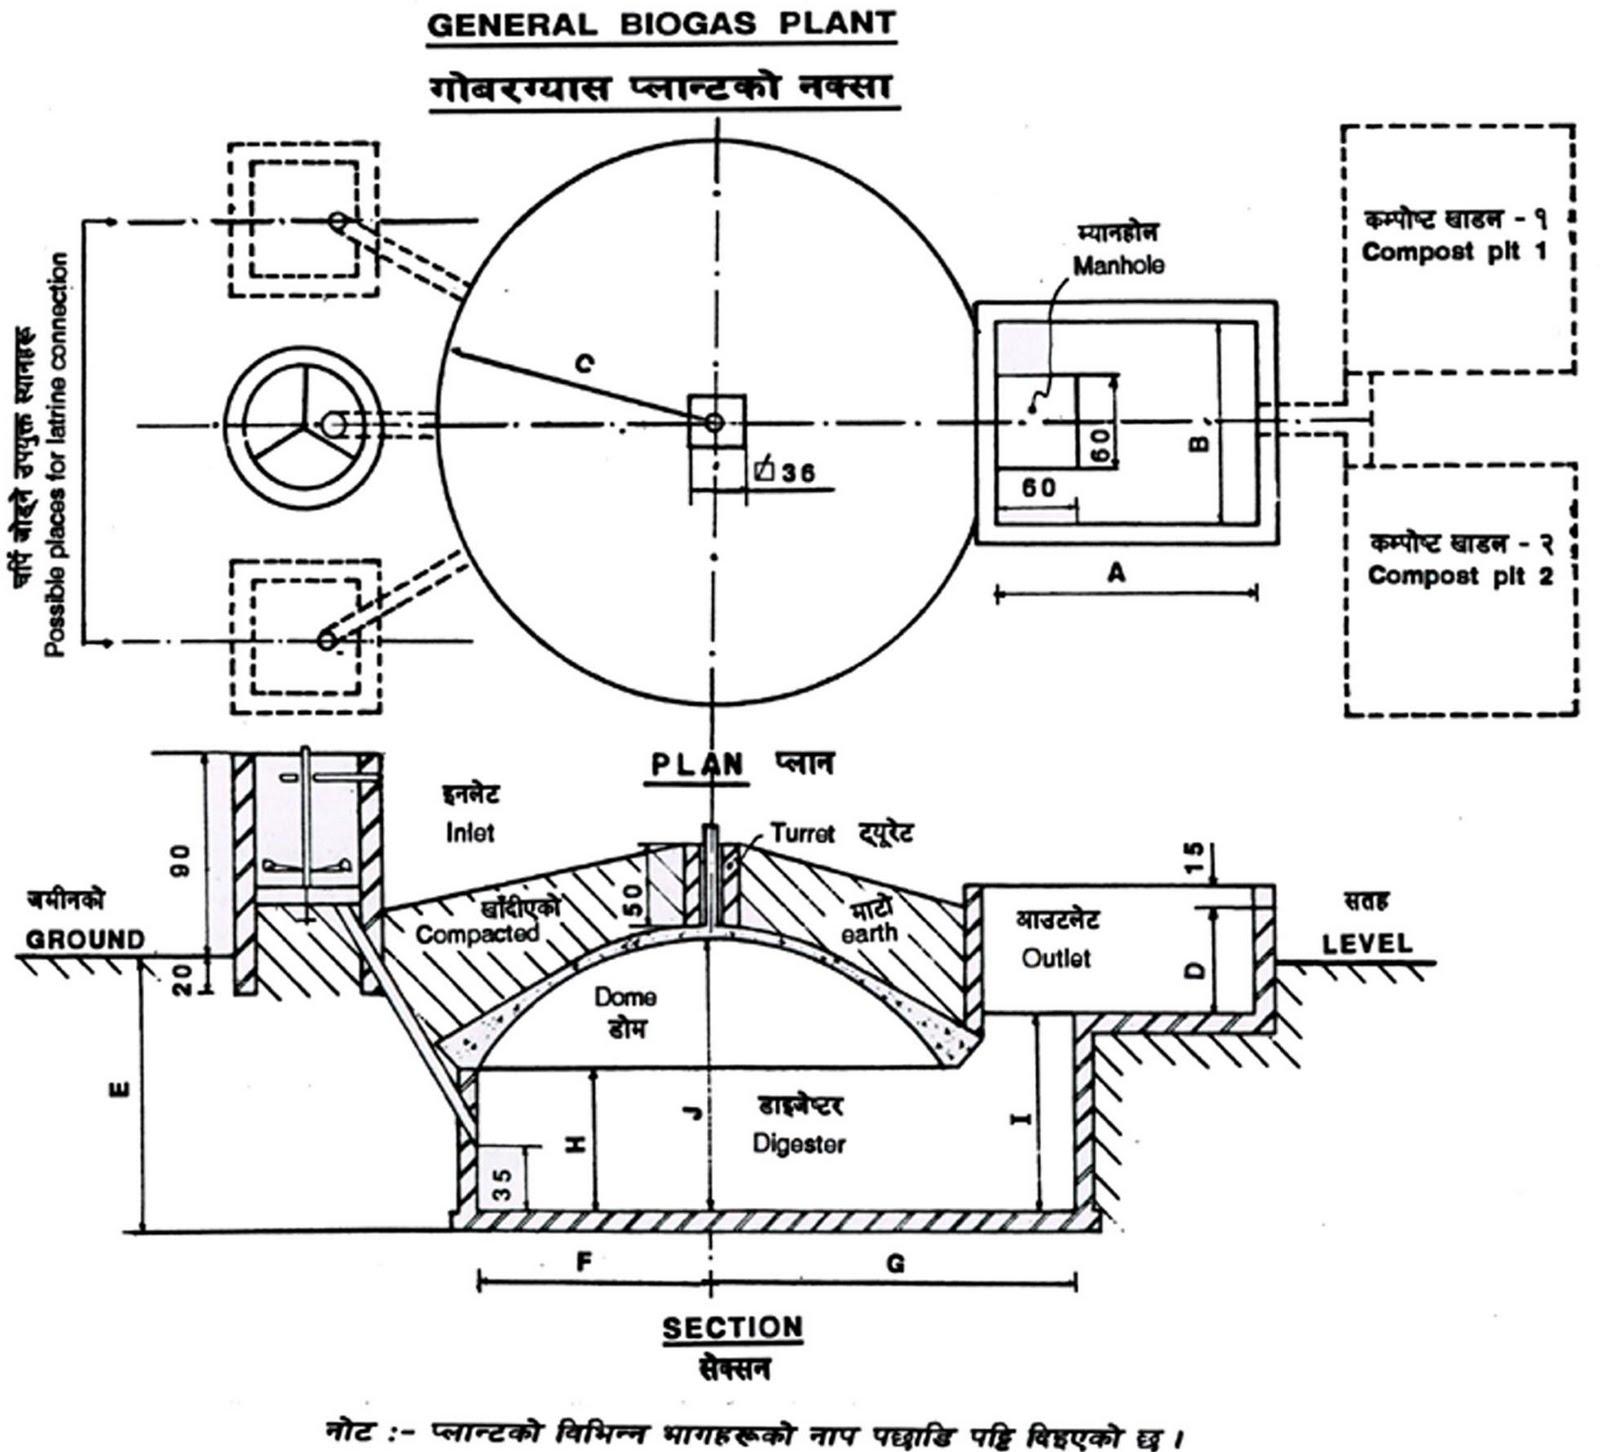 Biogas Construction Process